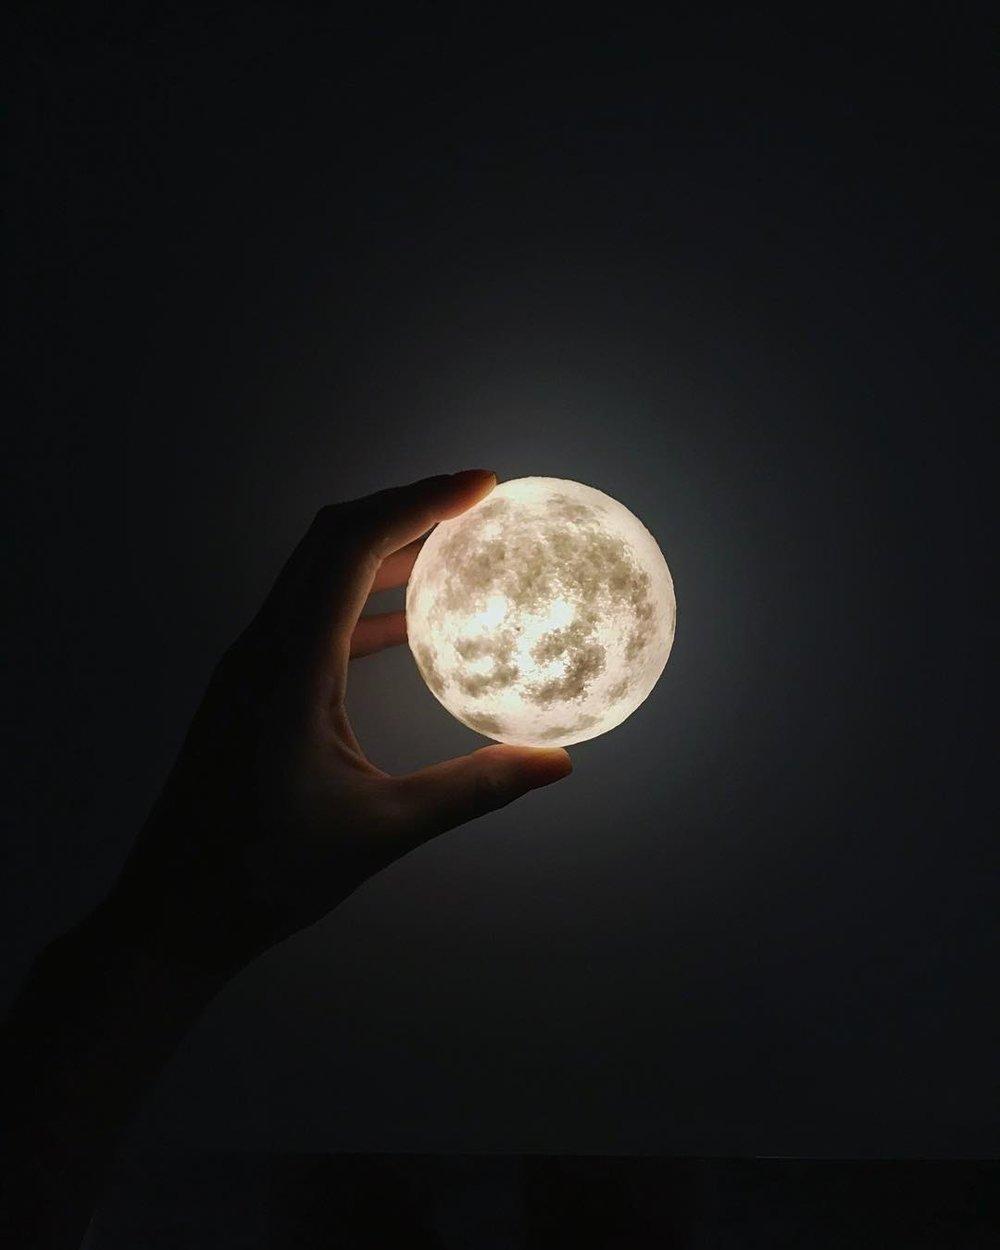 #lunalamp #月球燈luna #月亮燈 #acornartstudio  photo by @janettechuu